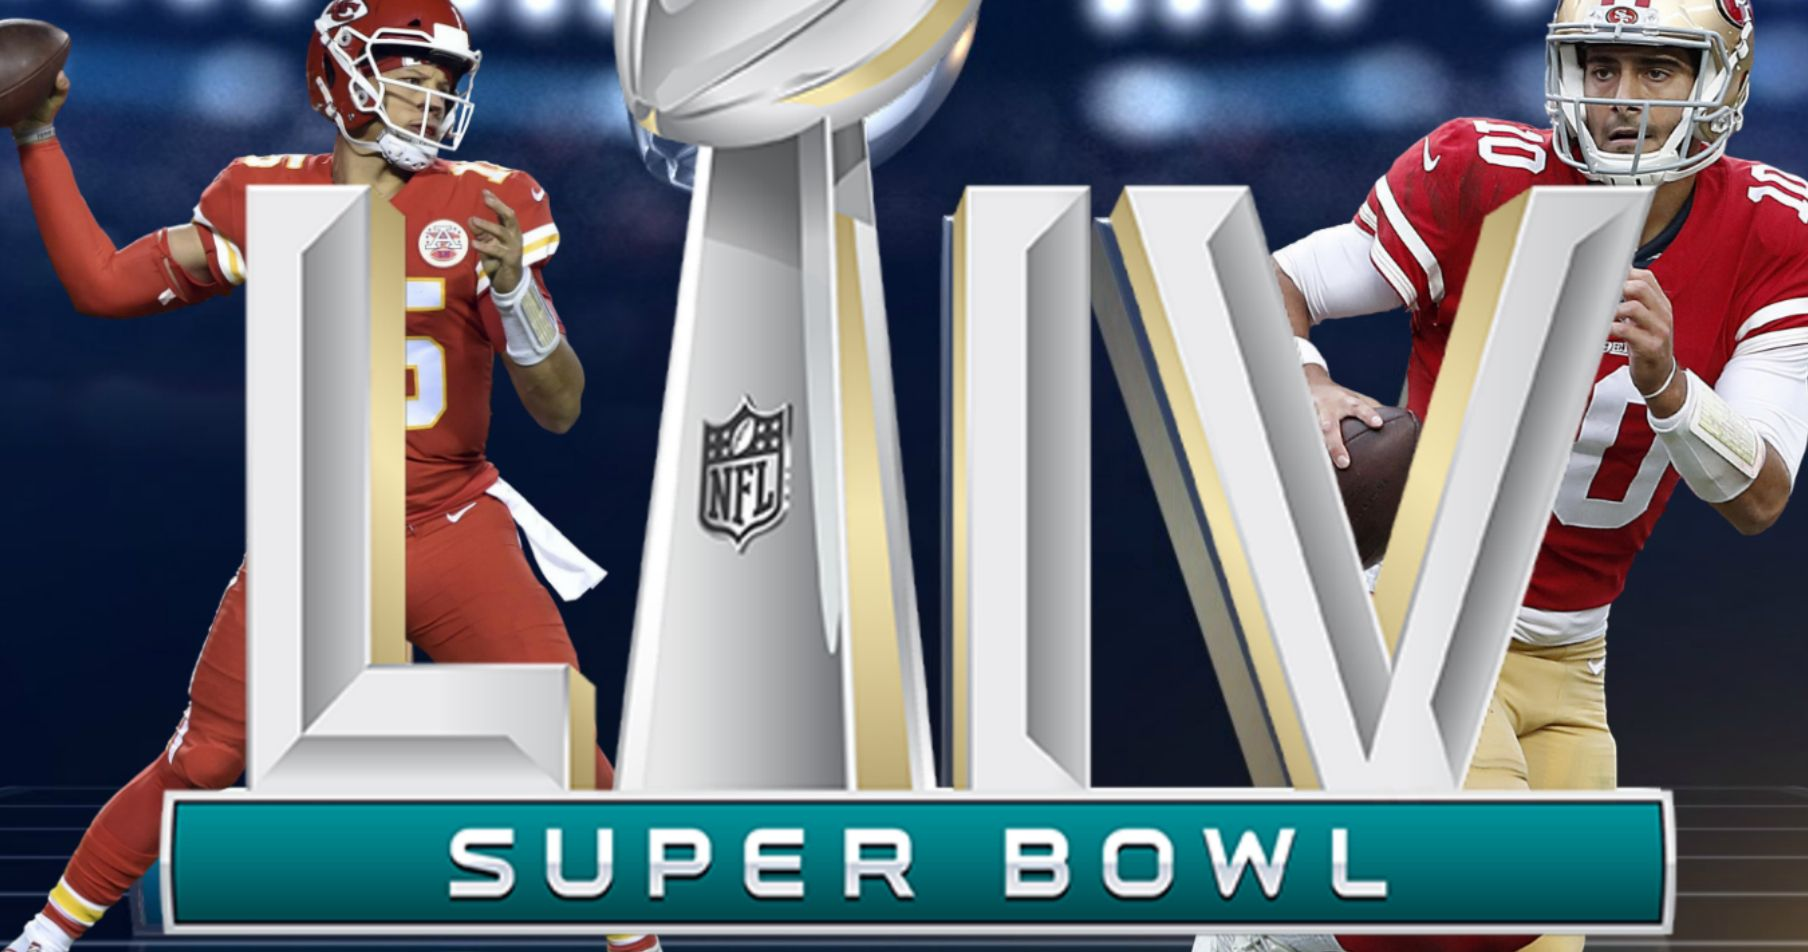 It S Kansas City Chiefs Vs San Francisco 49ers In Super Bowl 2020 Patrick Mahomes And Jimmy Garoppolo Will Go Hea In 2020 Super Bowl Kansas City Chiefs Kansas City